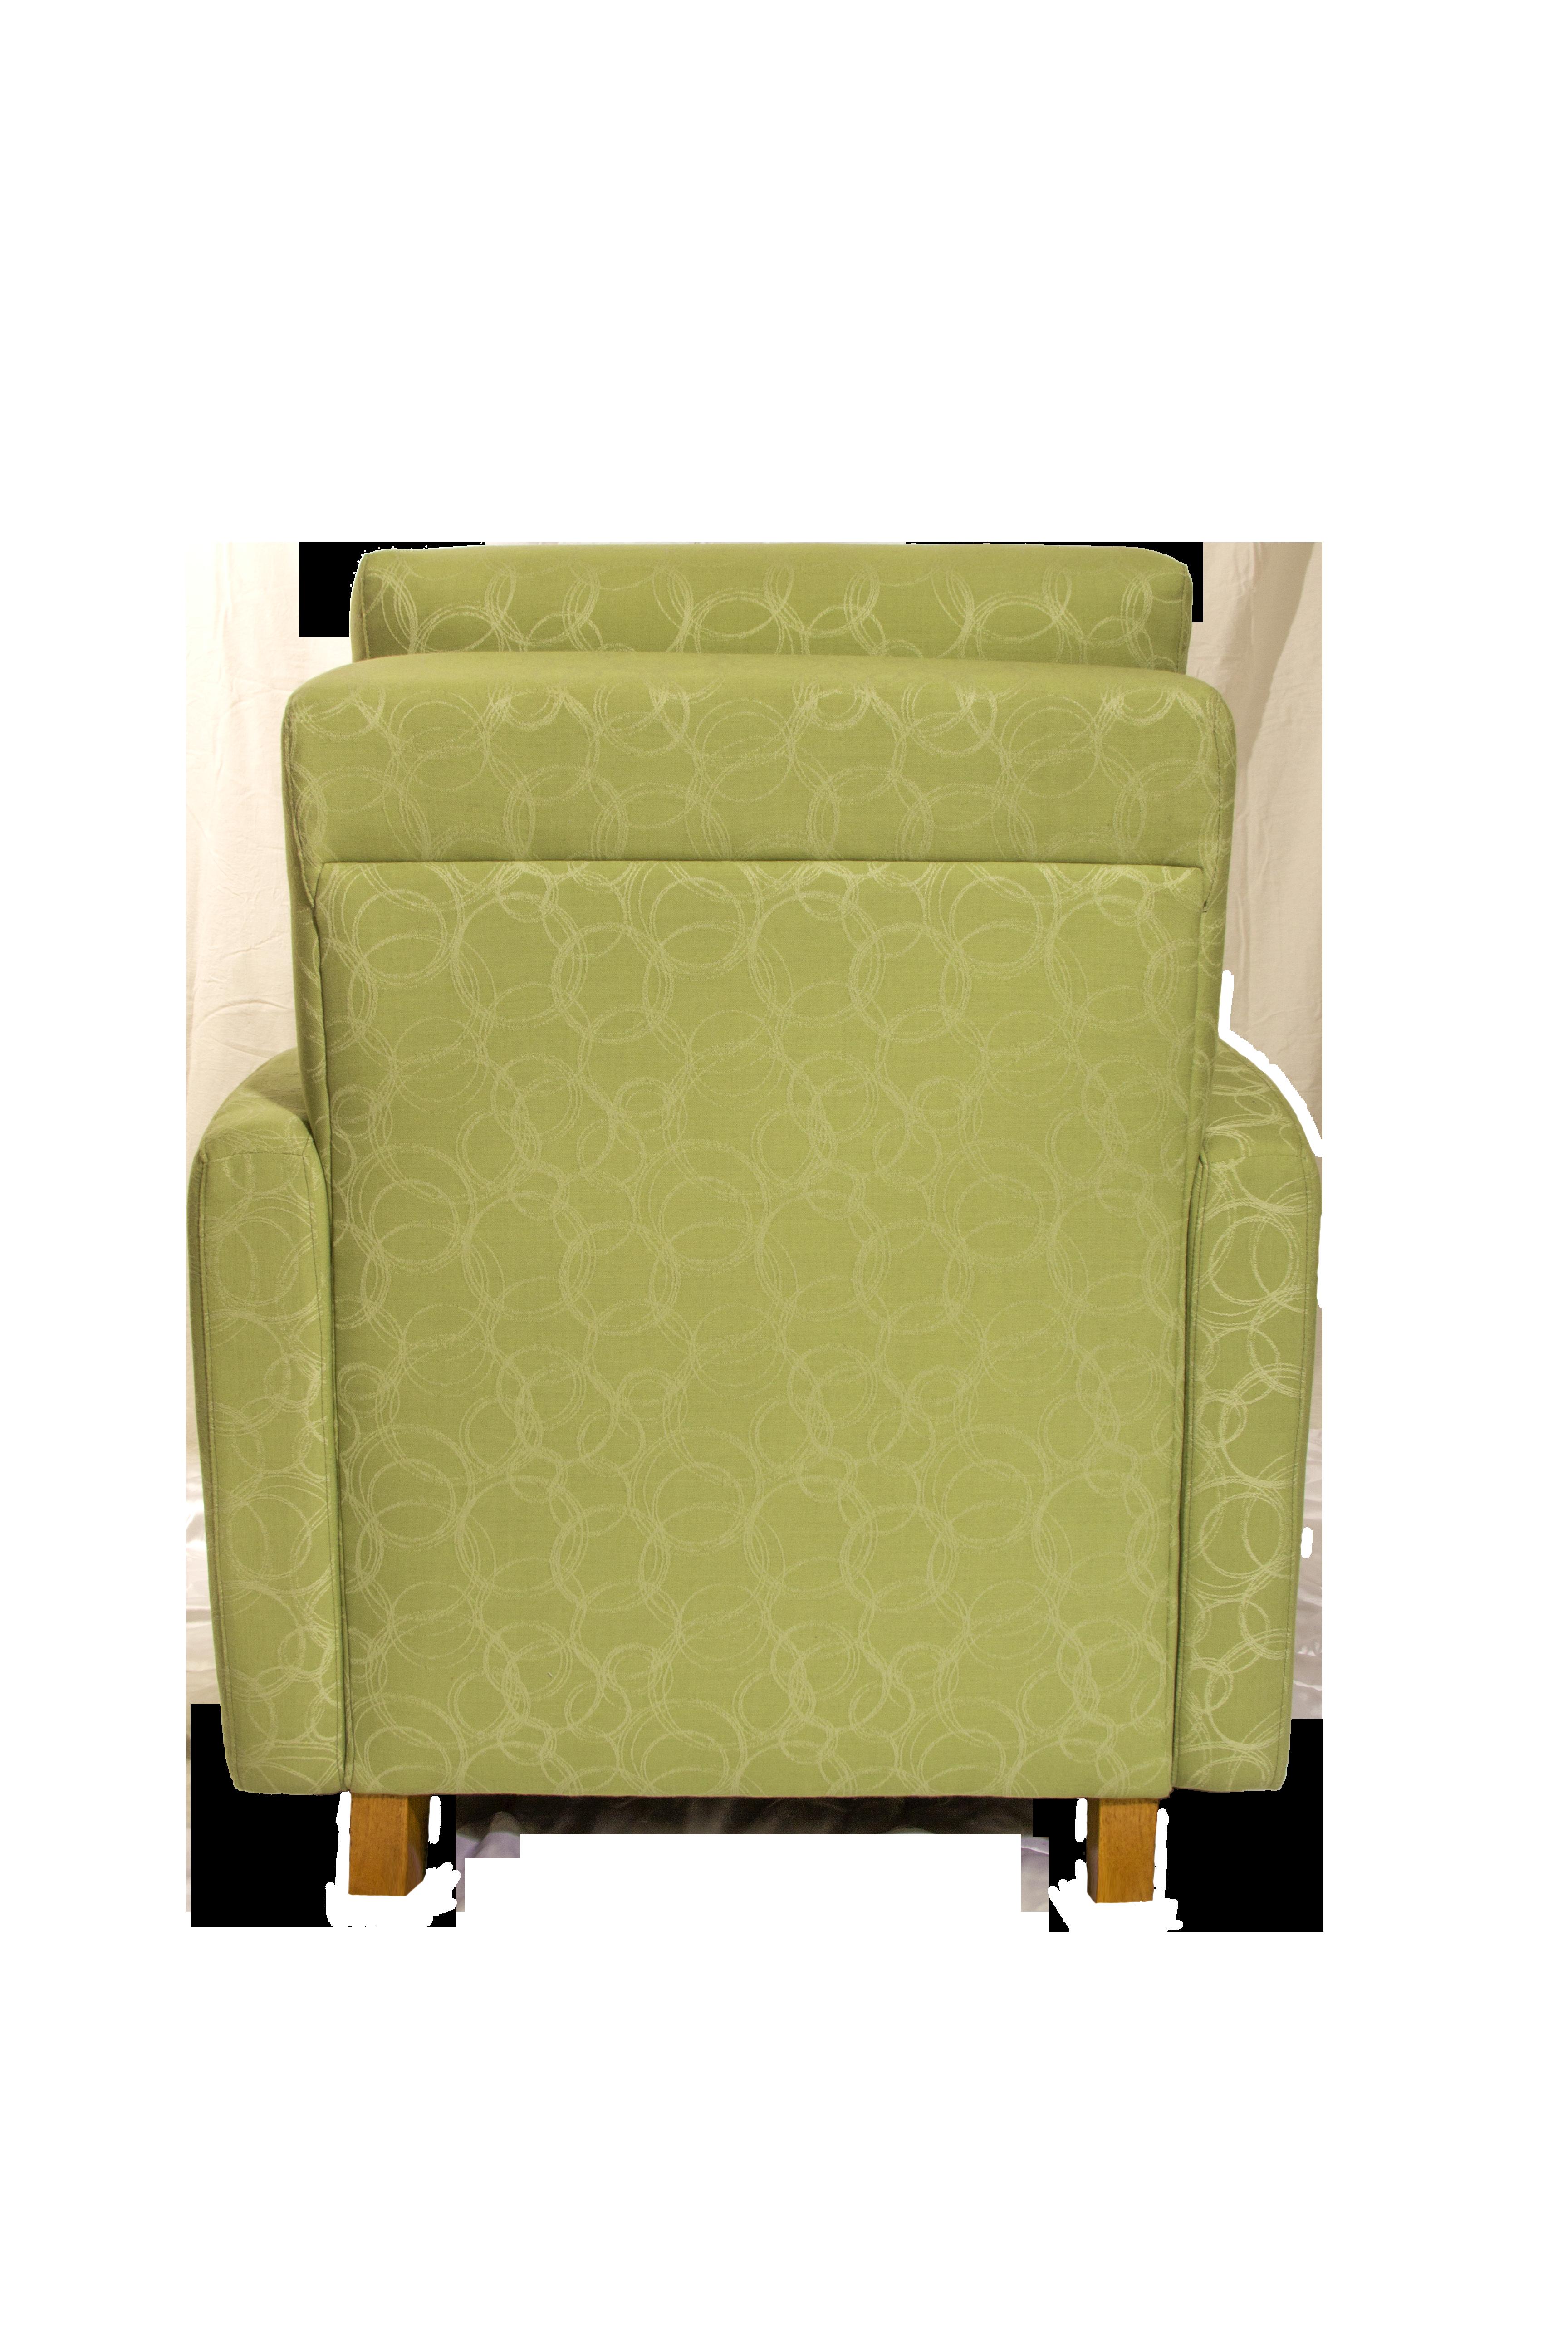 Dowerin Chair Back